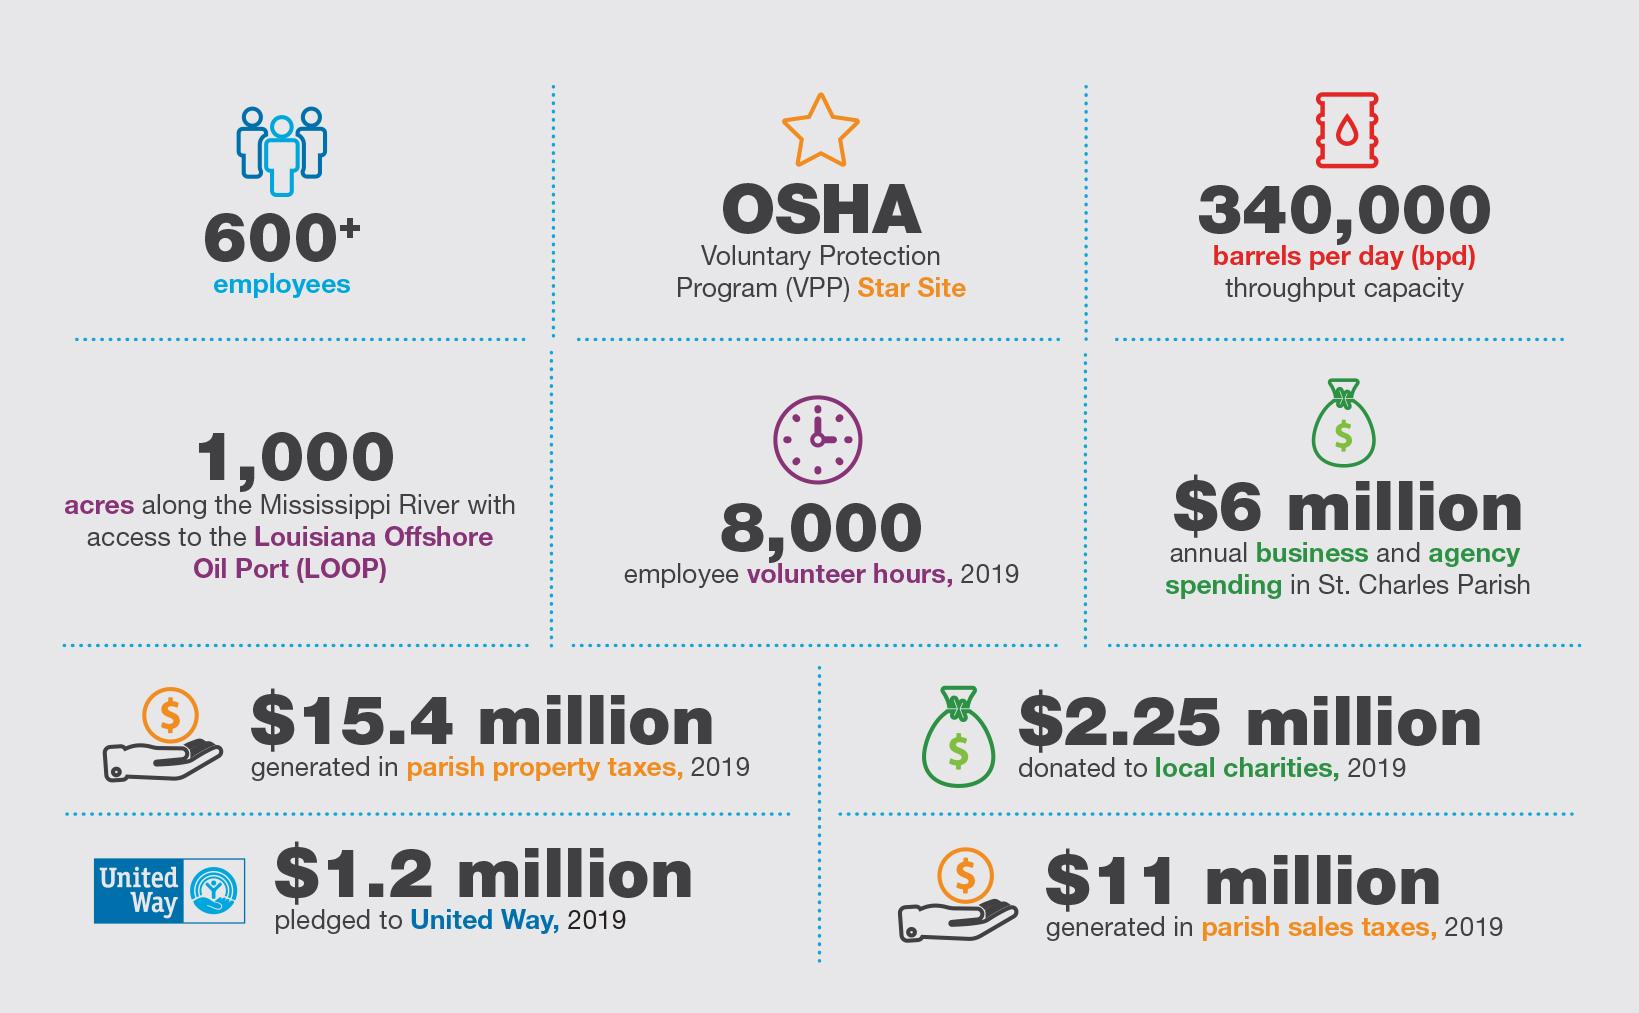 Valero St. Charles Refinery Infographic